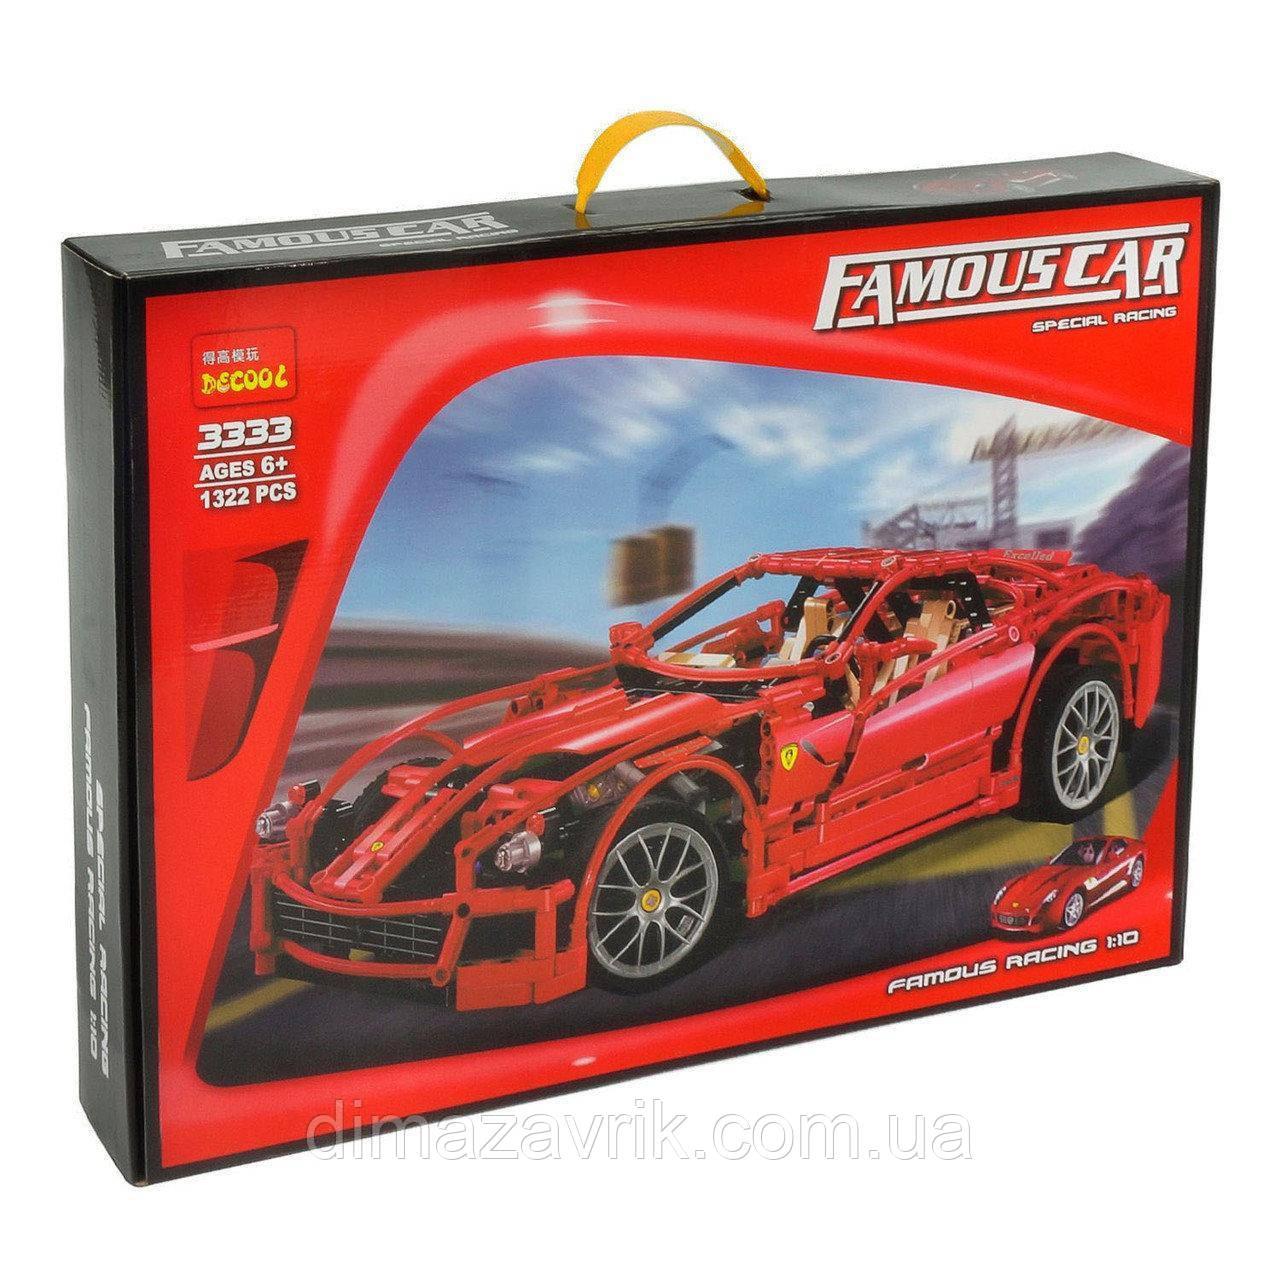 "Конструктор Decool 3333 (Аналог Lego Technic 8145) ""Ferrari 599 GTB Fiorano"" 1322 деталей"